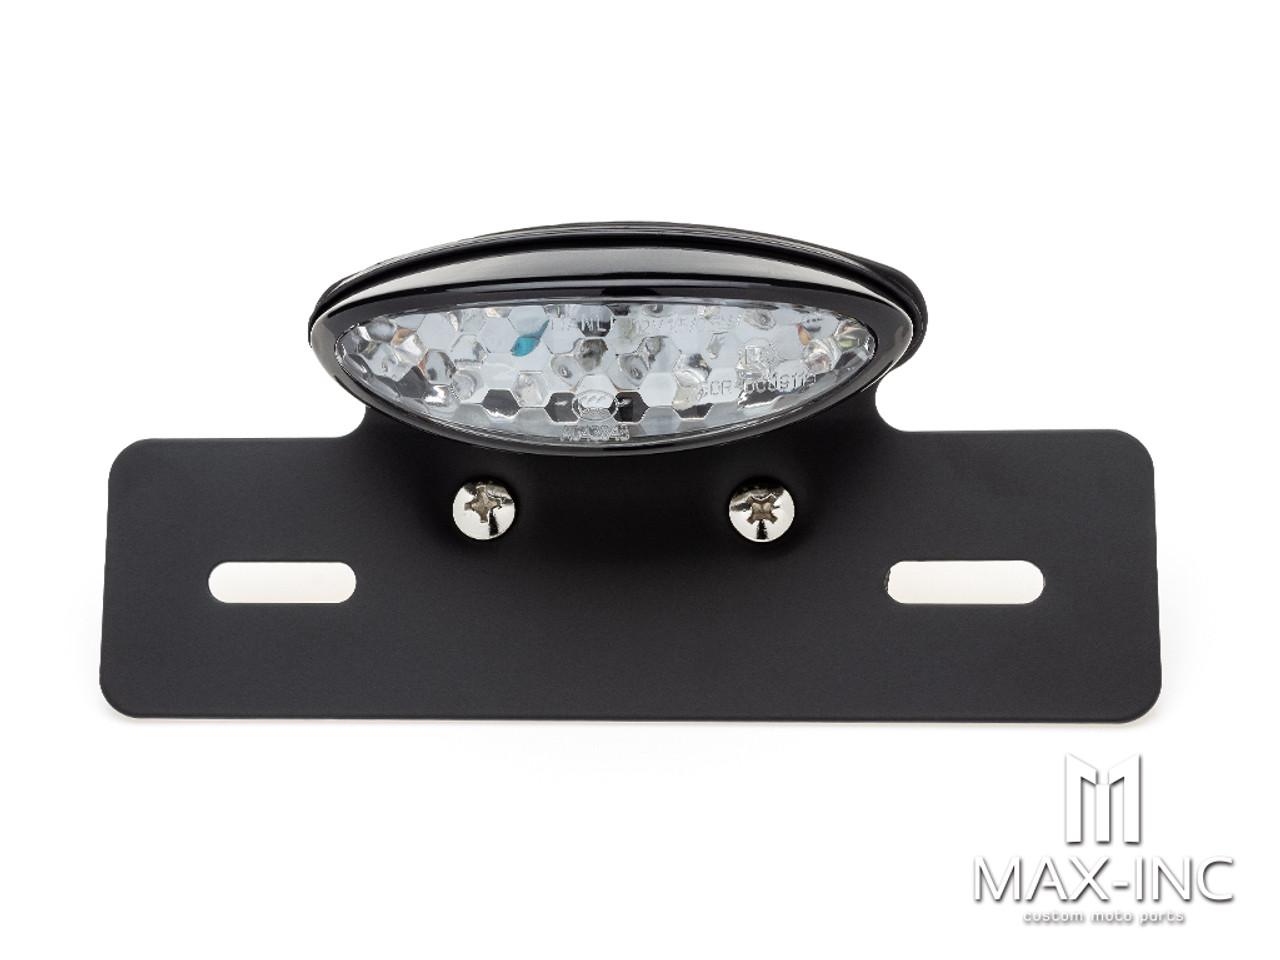 Black Oval LED Stop / Tail Light + License Plate Holder - Clear Lens